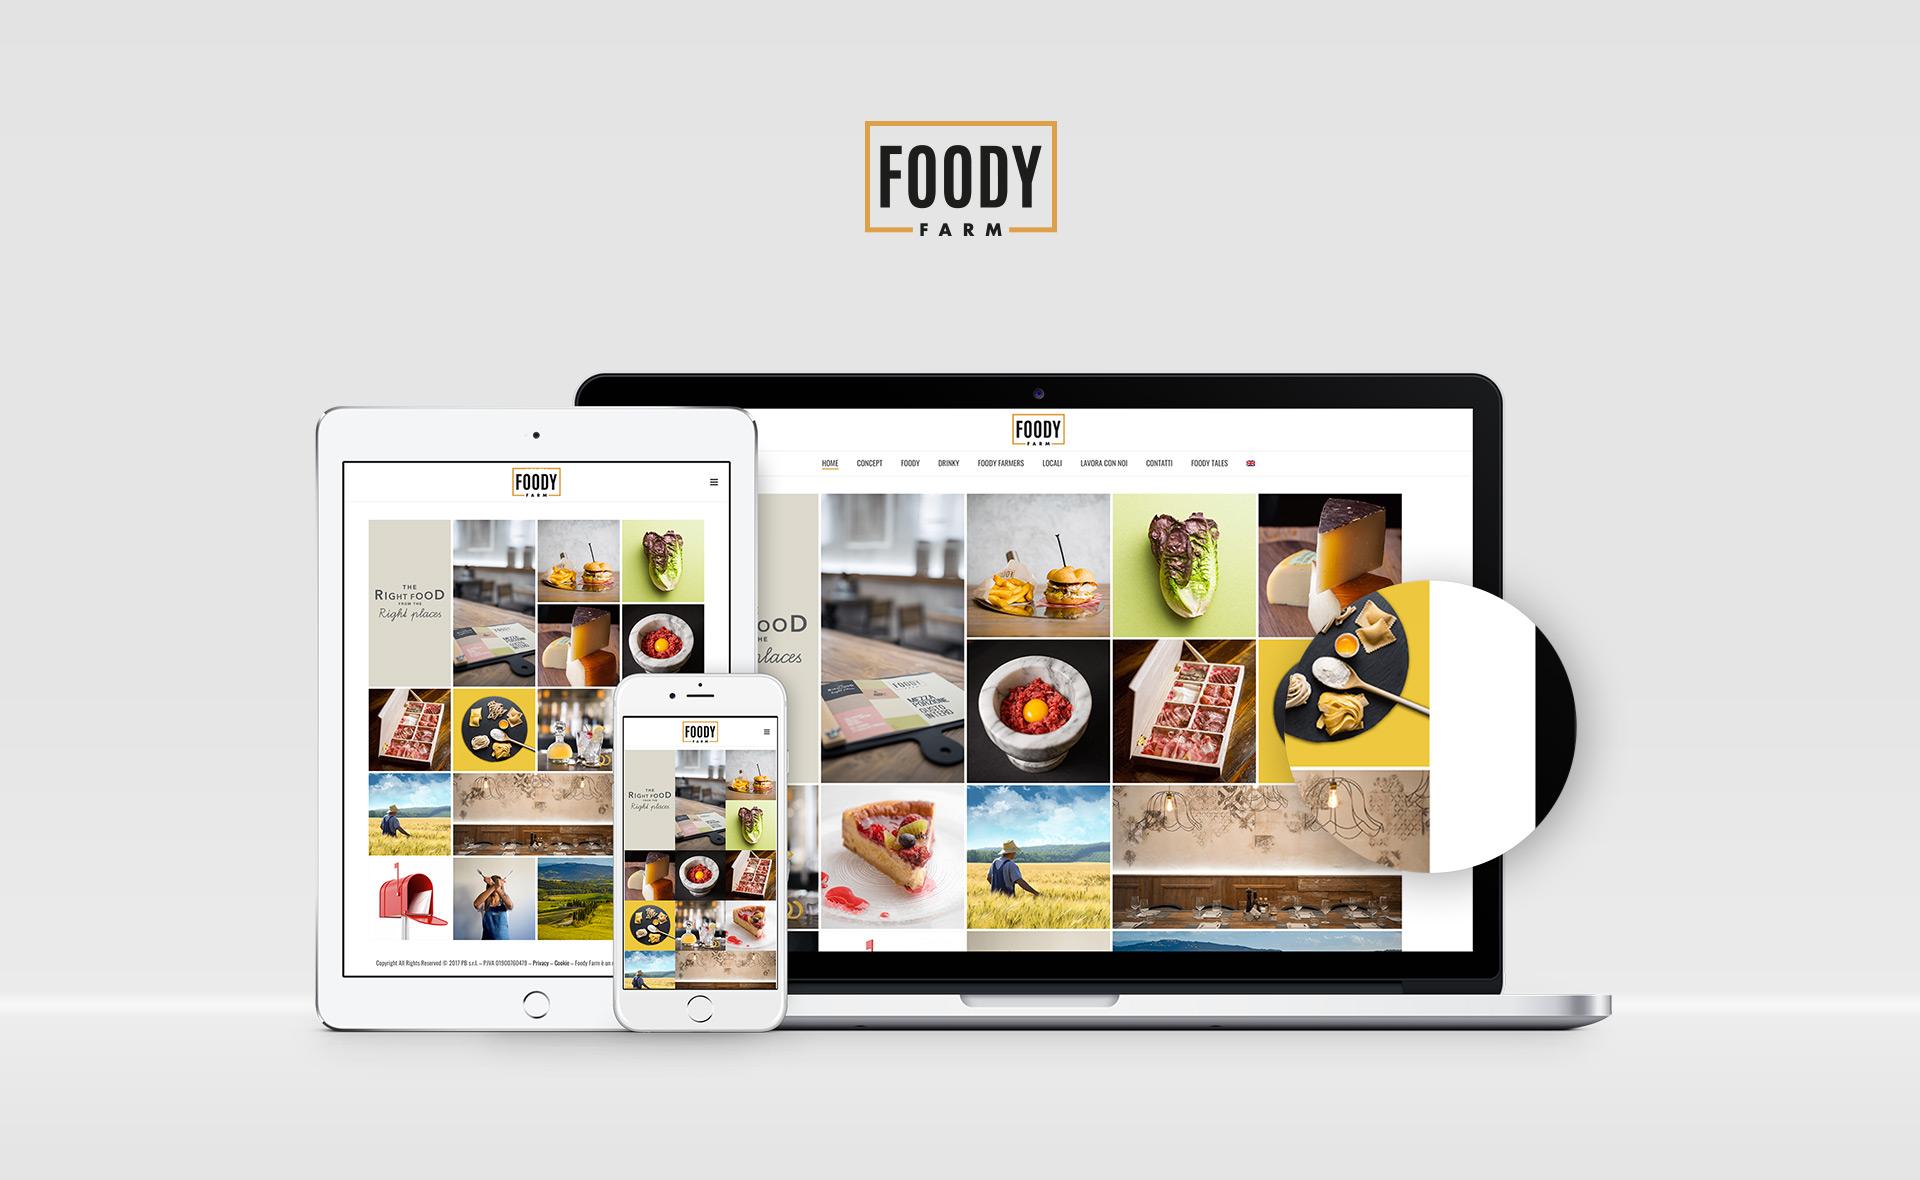 foodyfarm-website1